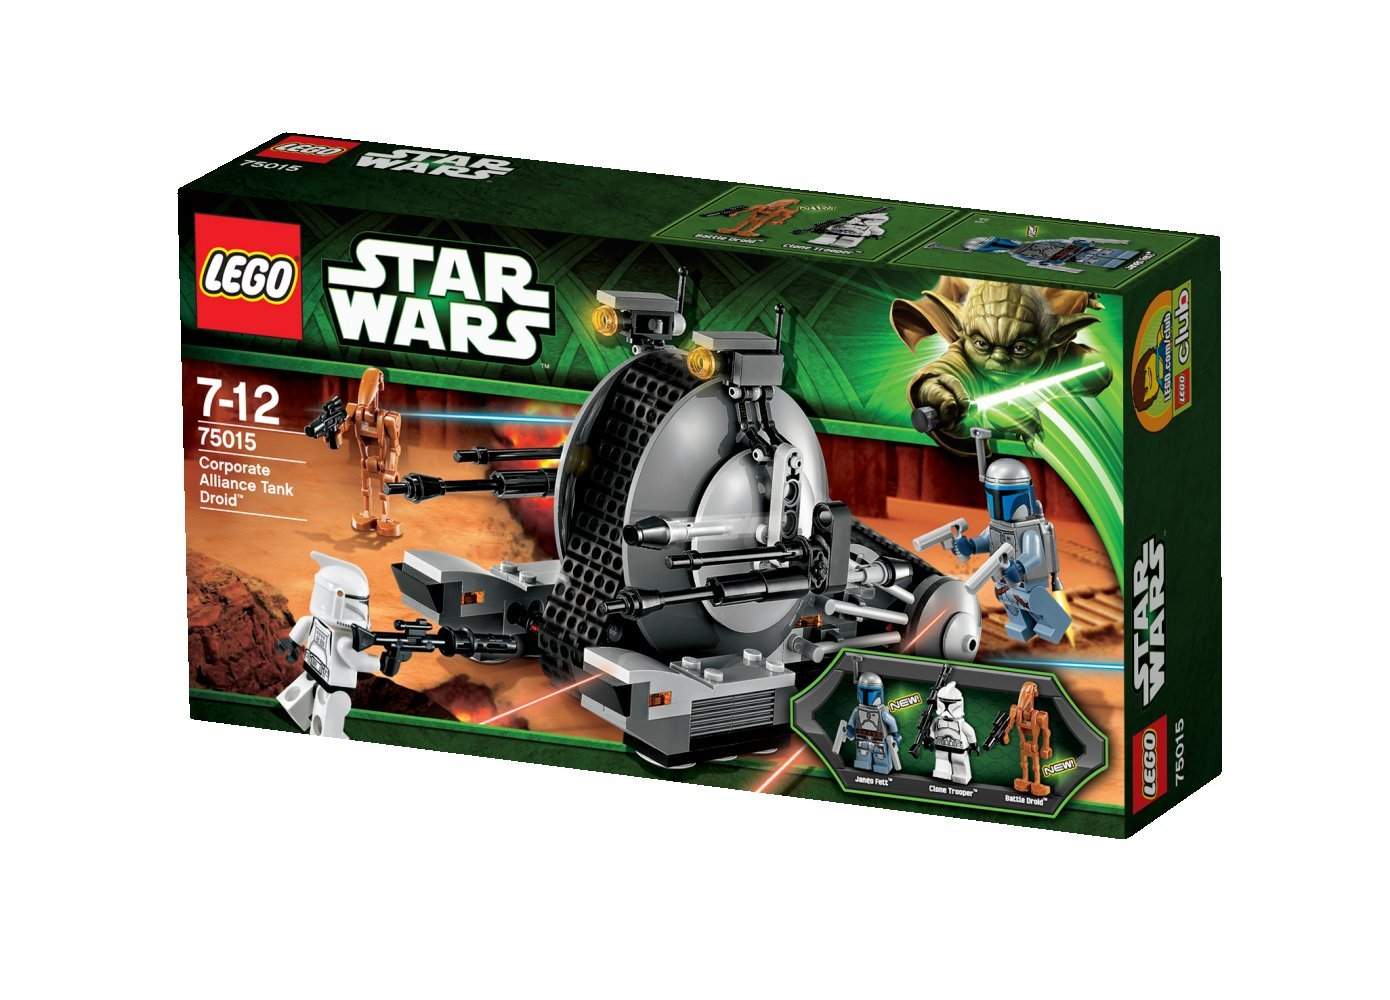 LEGO Star Wars  Corporate dp BBIEMK